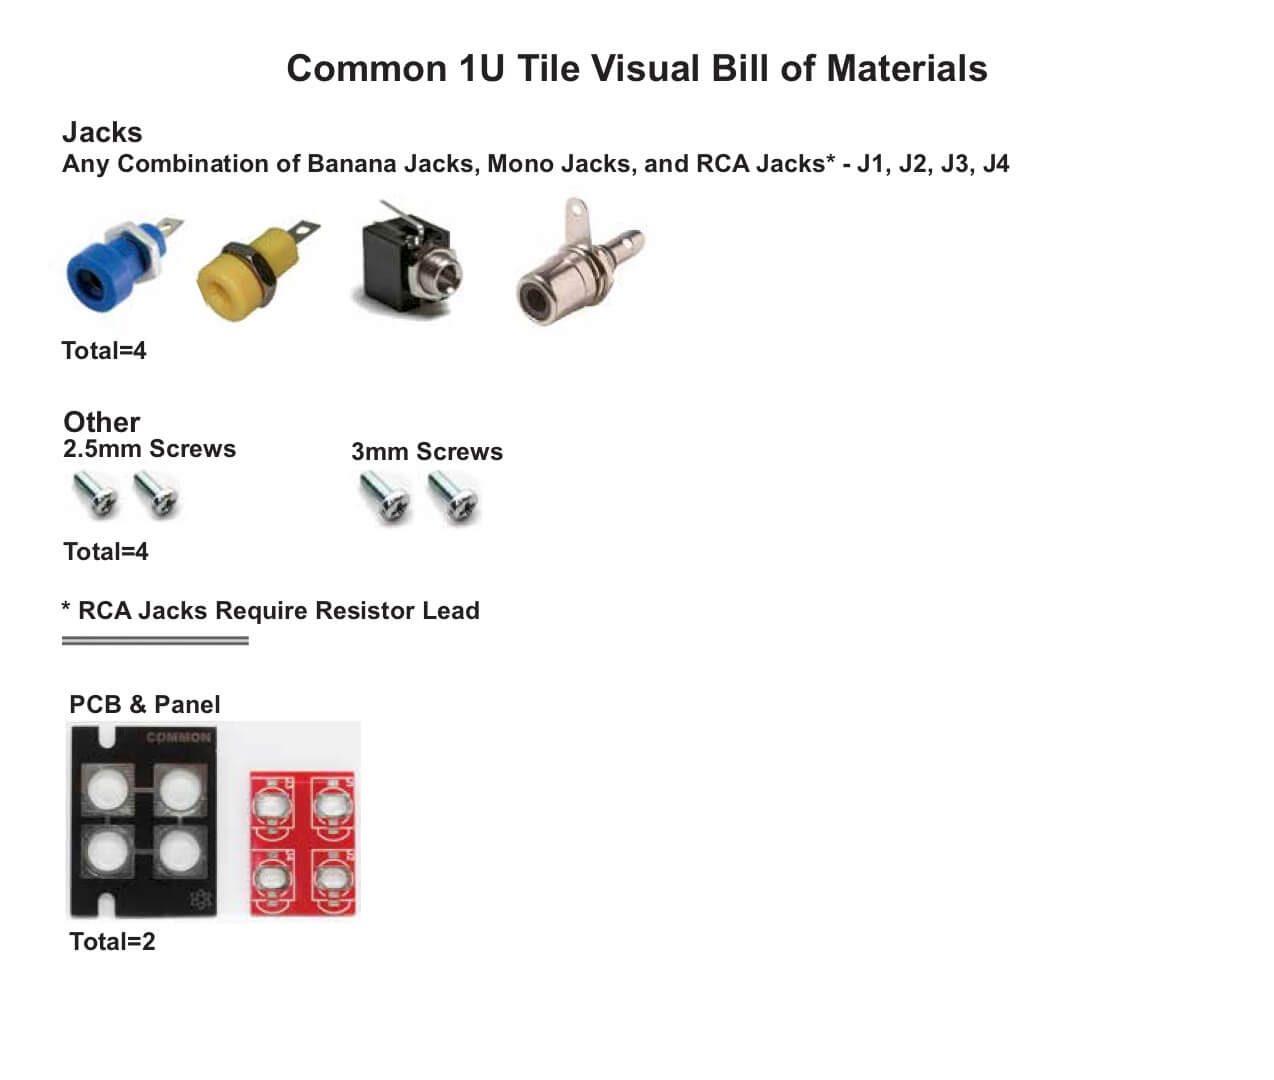 Common 1U Tile Visual Bill of Materials